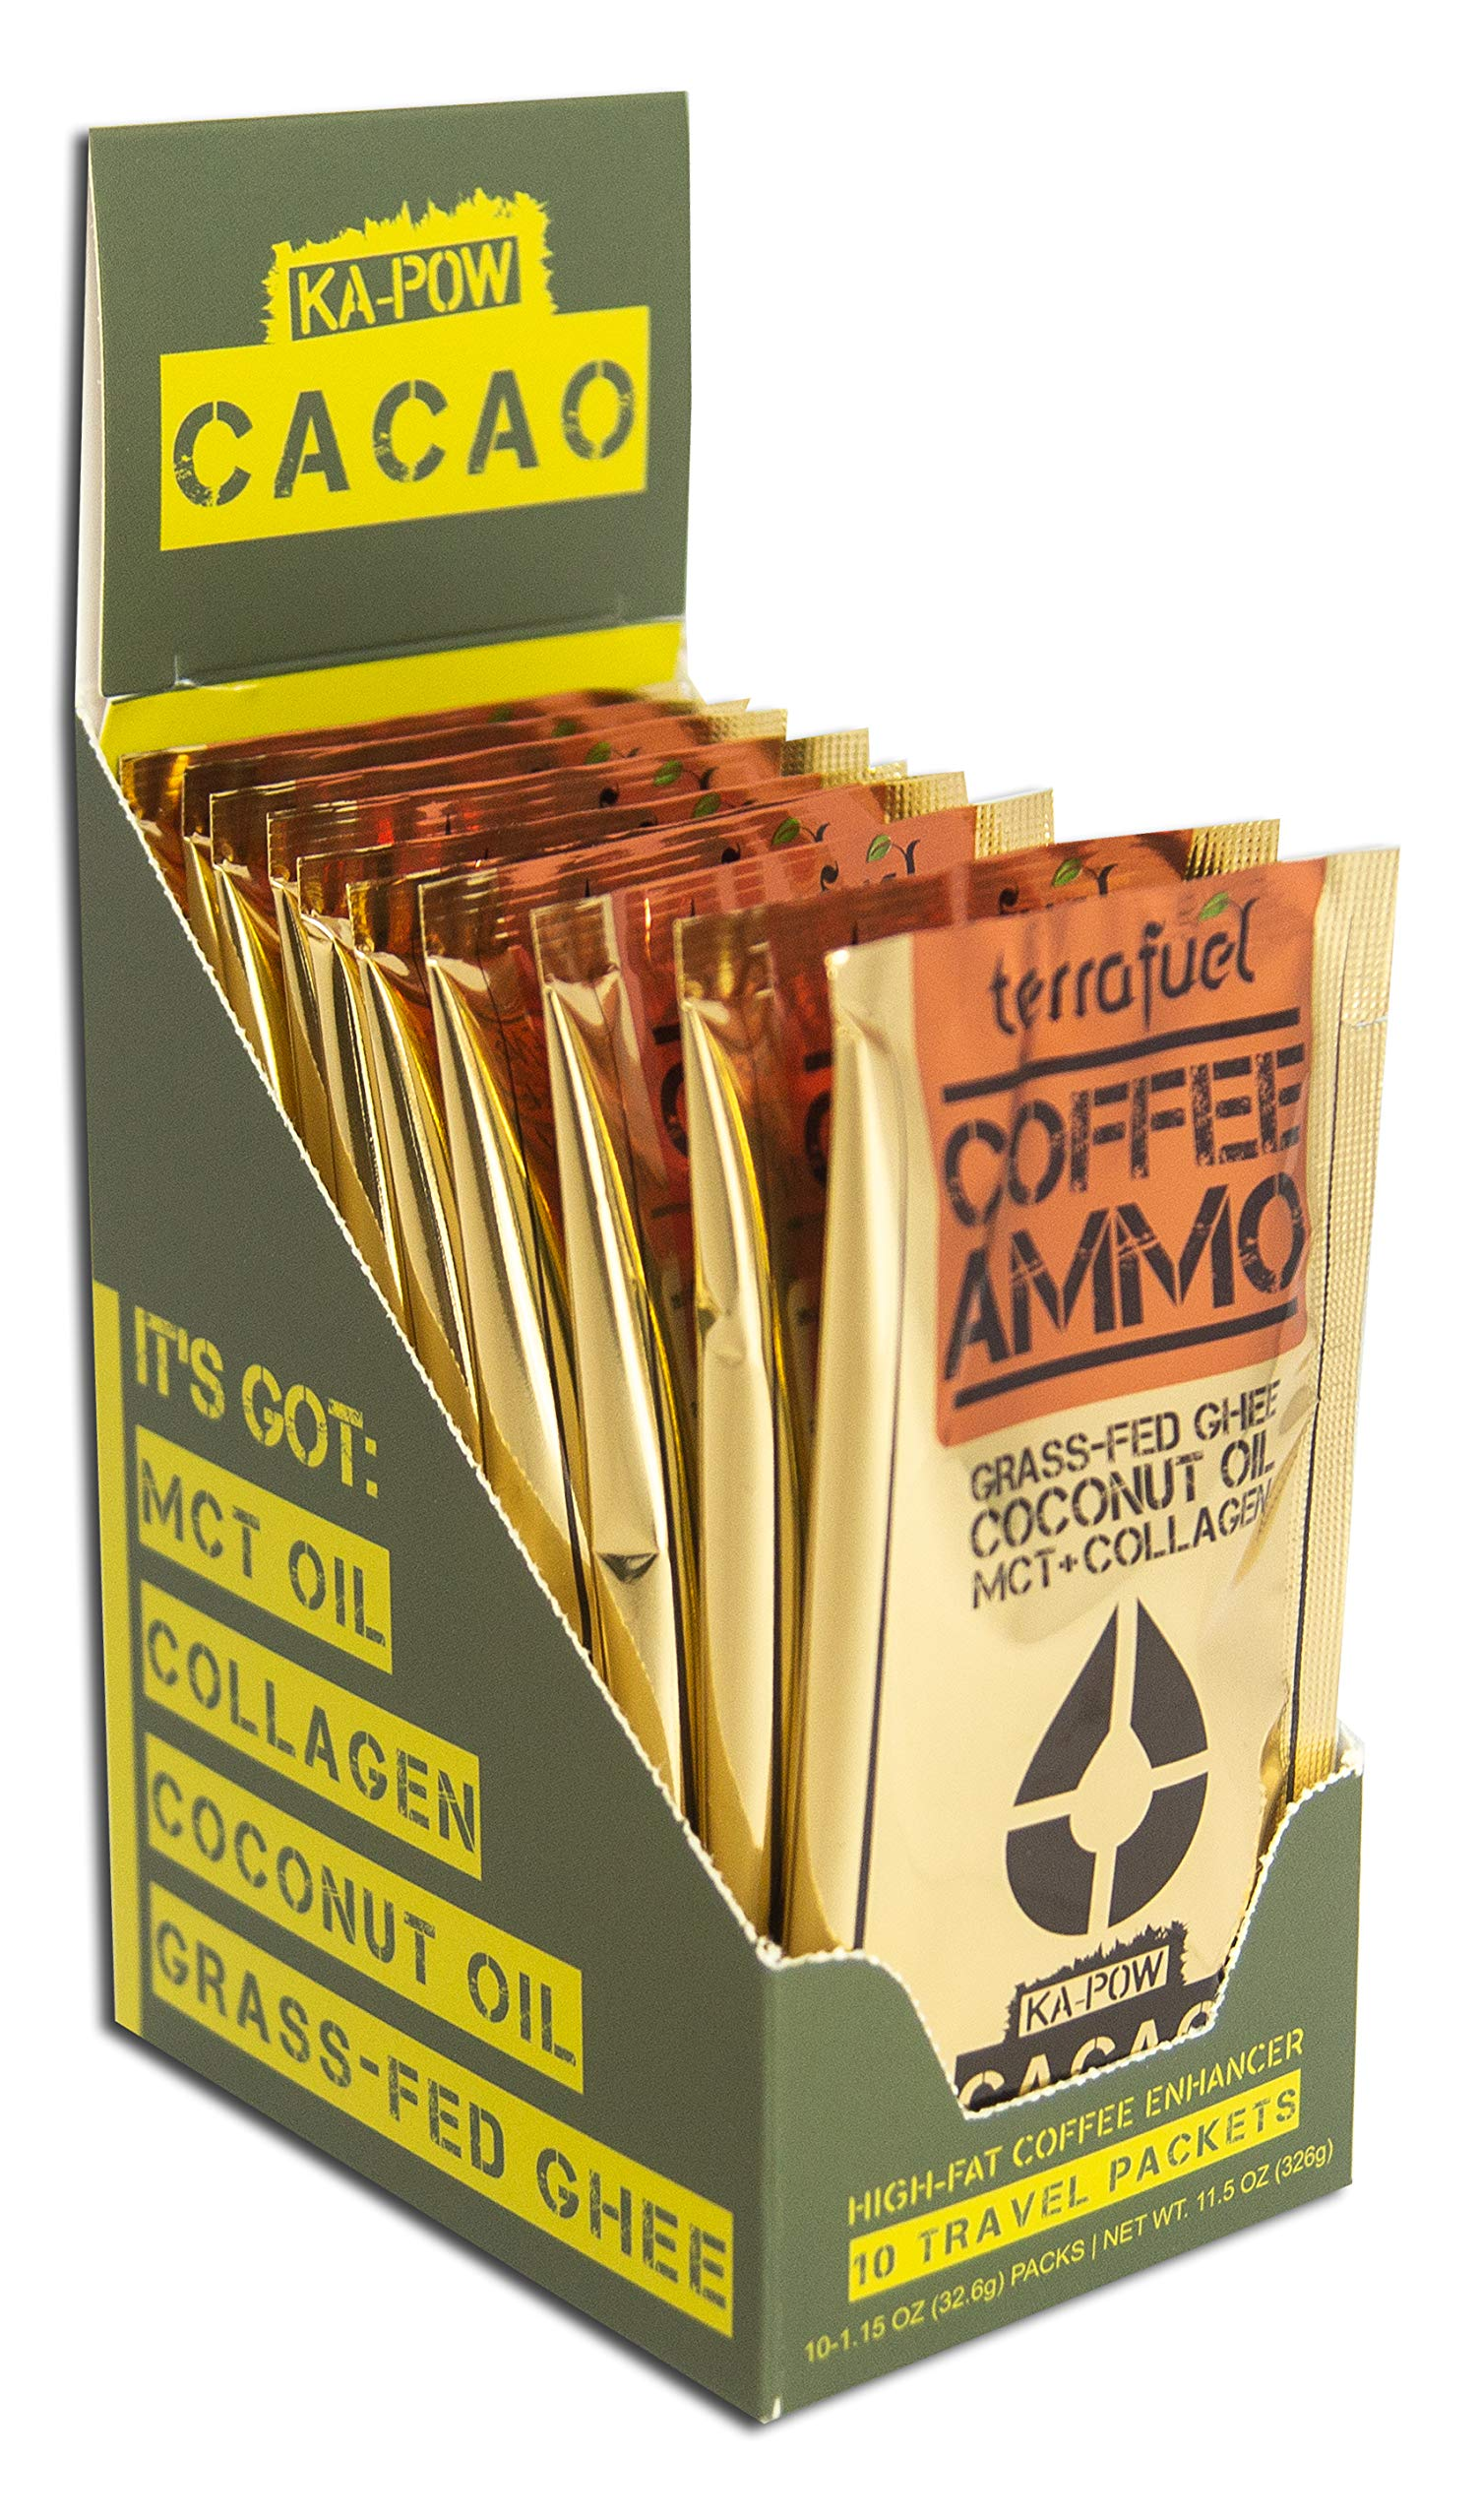 Keto Mocha Coffee Booster - Coffee Ammo - Turns Black Coffee into a Chocolate Mocha (Ka-Pow Cacao, 10-Packet Box) by TerraFuel